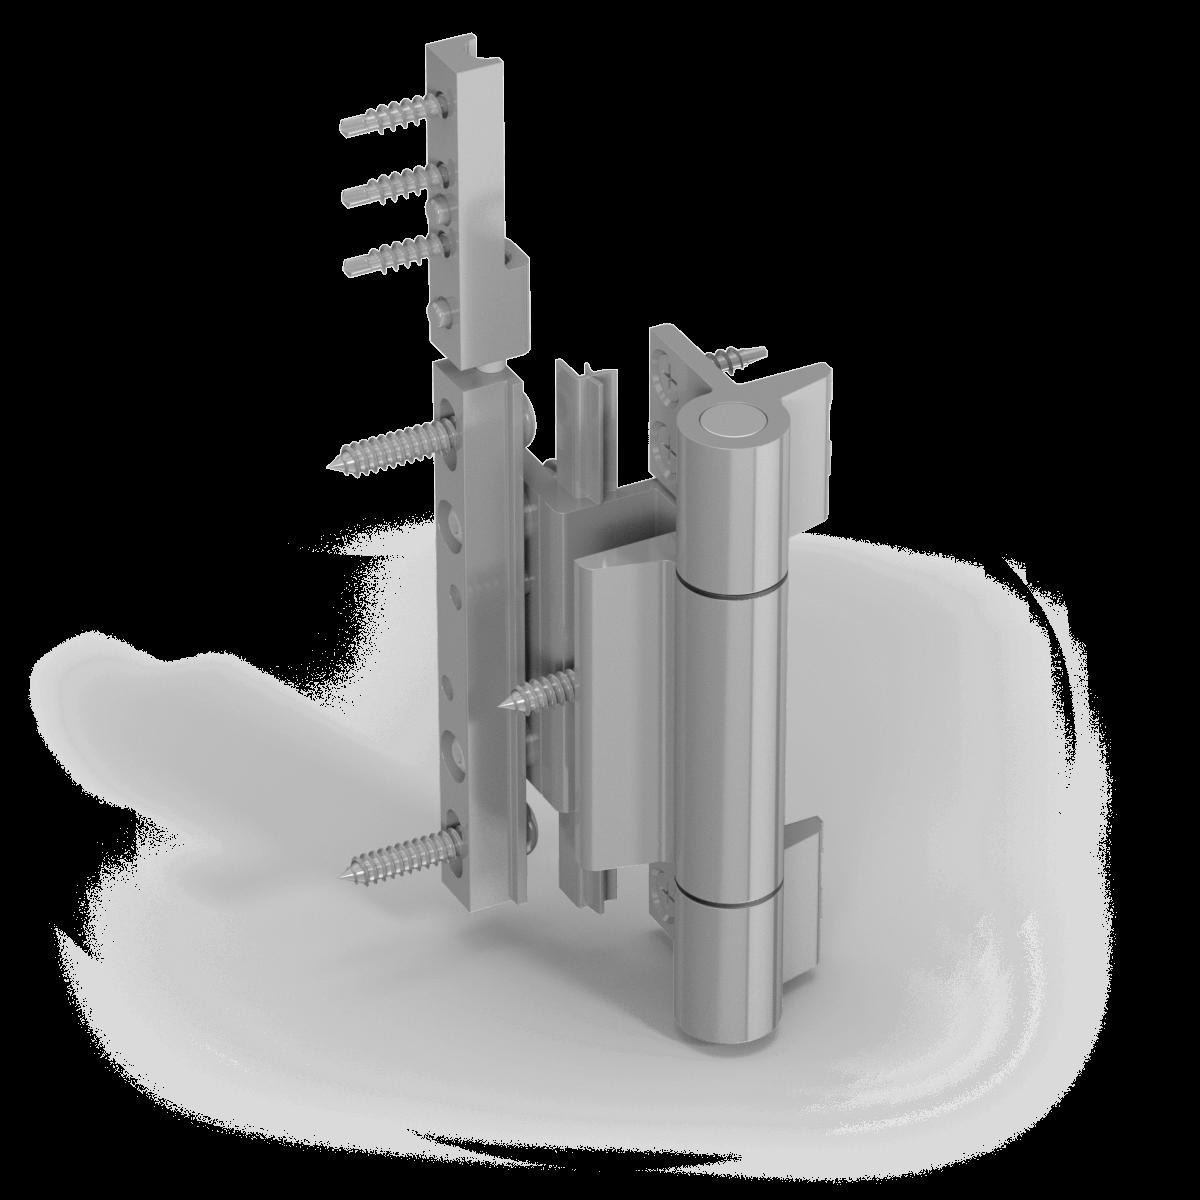 kt rf rollenband f r t ren mit blockprofilen dr hahn. Black Bedroom Furniture Sets. Home Design Ideas